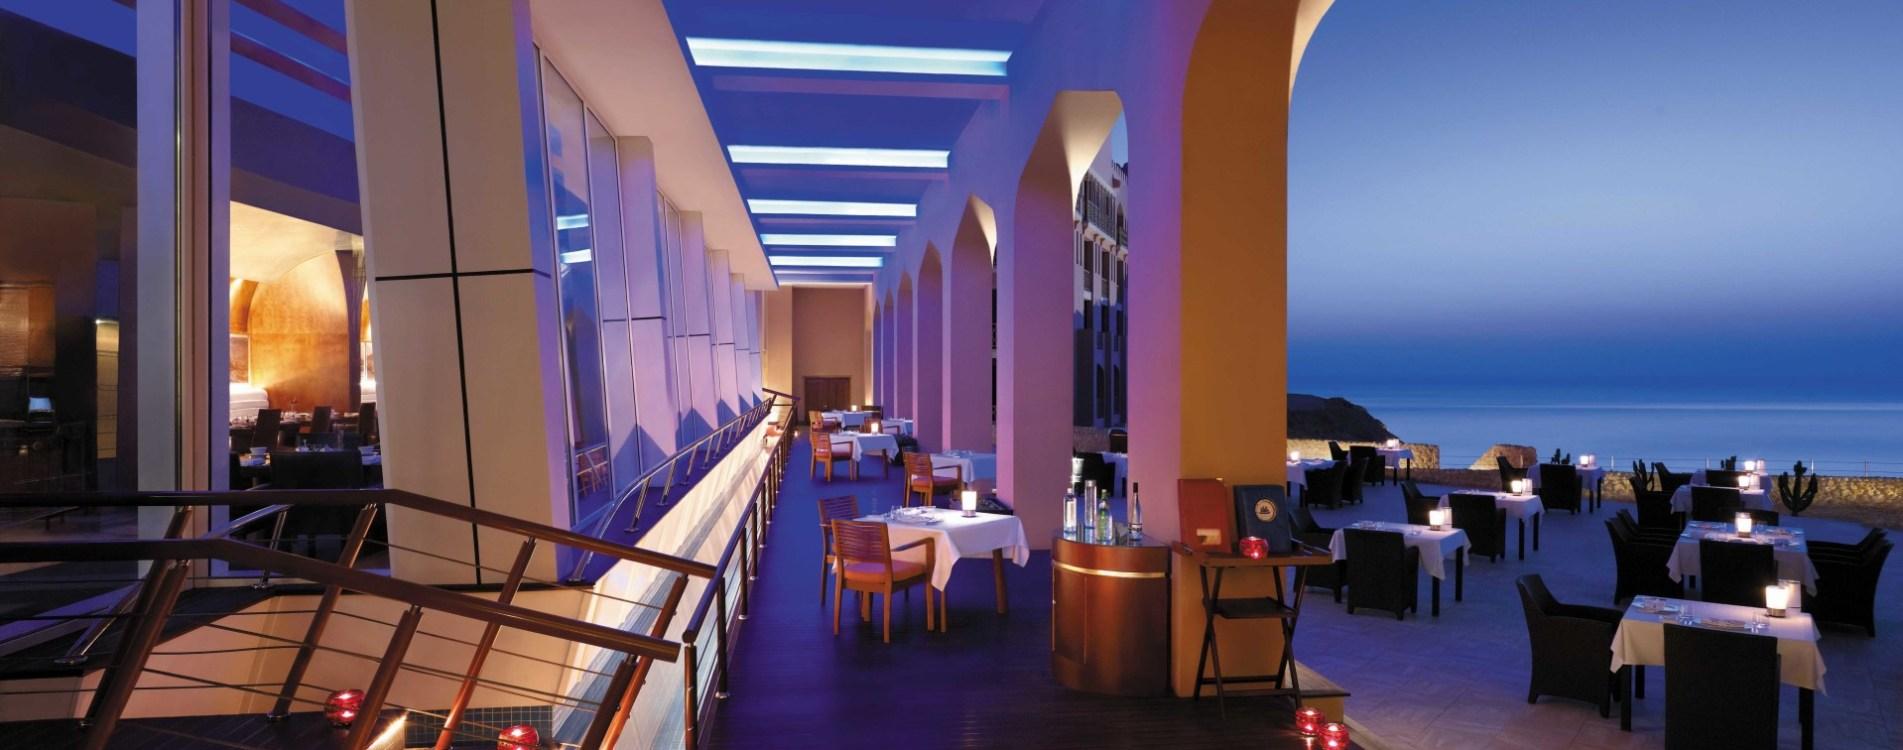 Shangri-La-Al-Husn-Resort-and-Spa-Sultanah-Restaurant-Terrasse-Abend-Oman.jpg